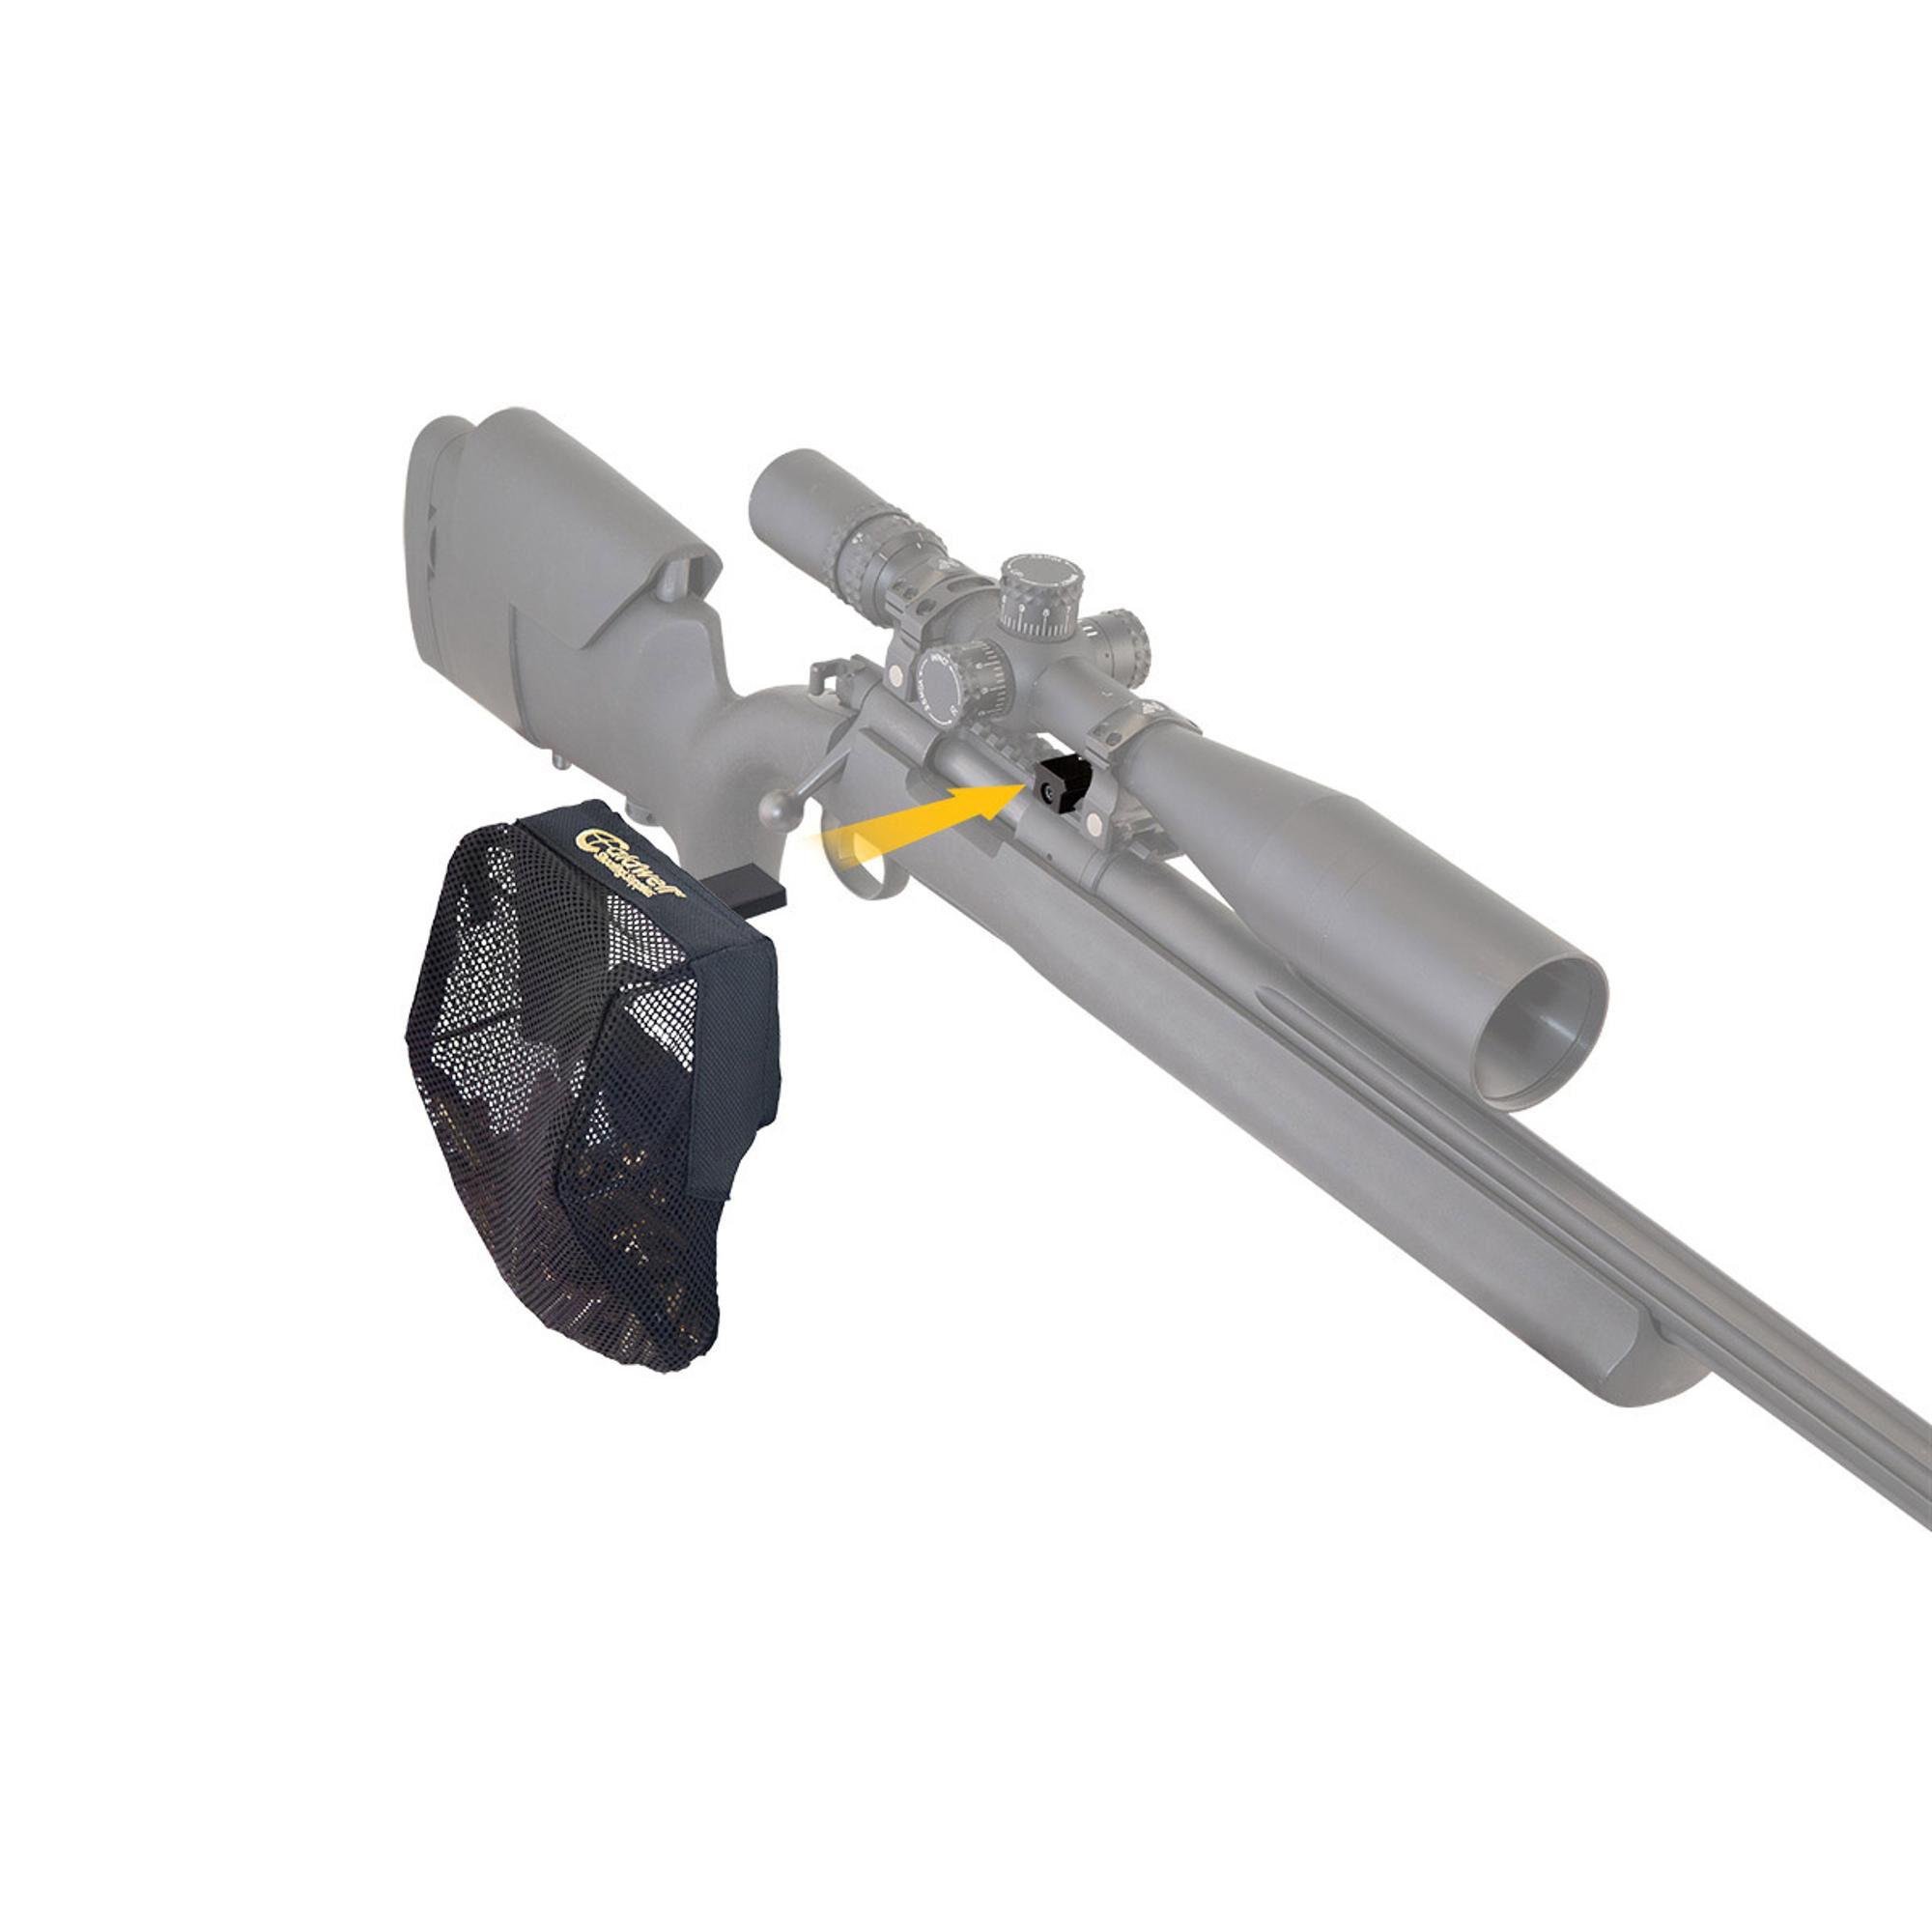 Caldwell 530143 Fully Adjustable Rifle Pic Rail Picatinny Brass Catcher Mesh Bag